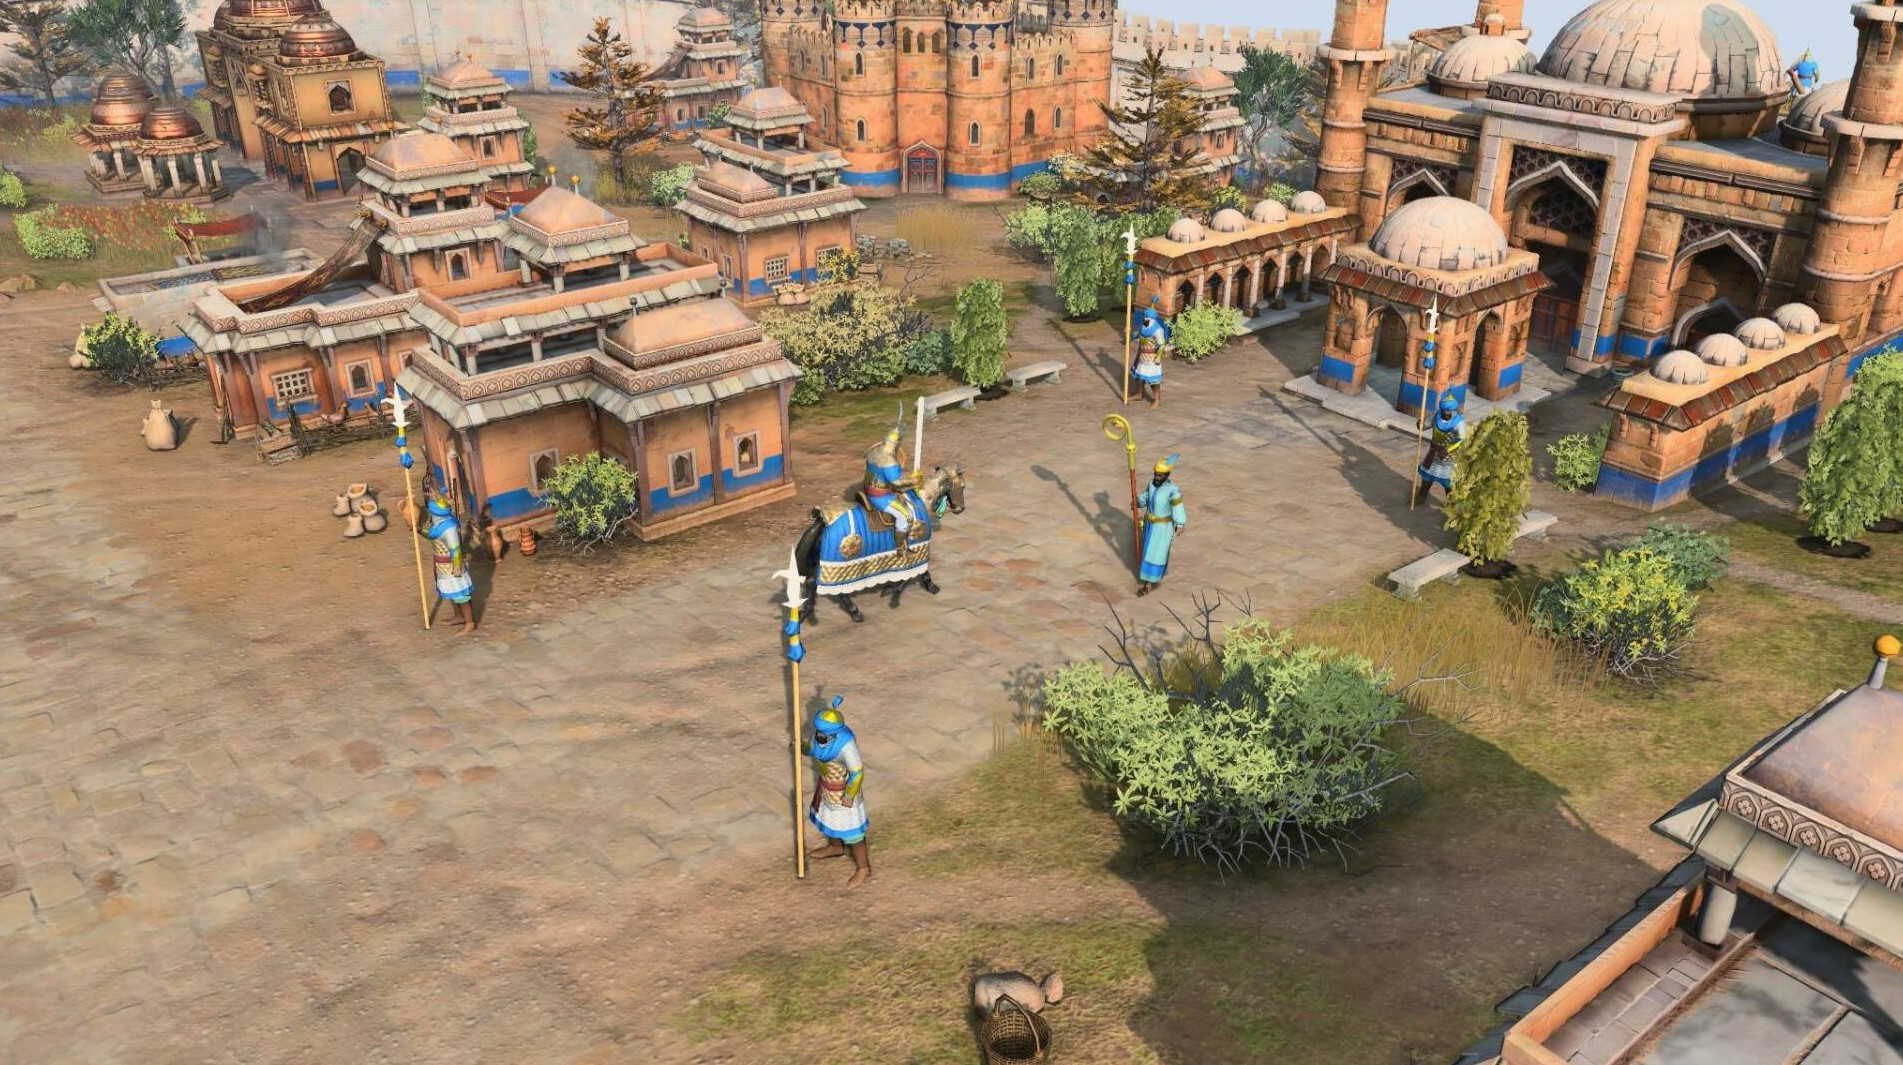 Age of Empires IV open beta